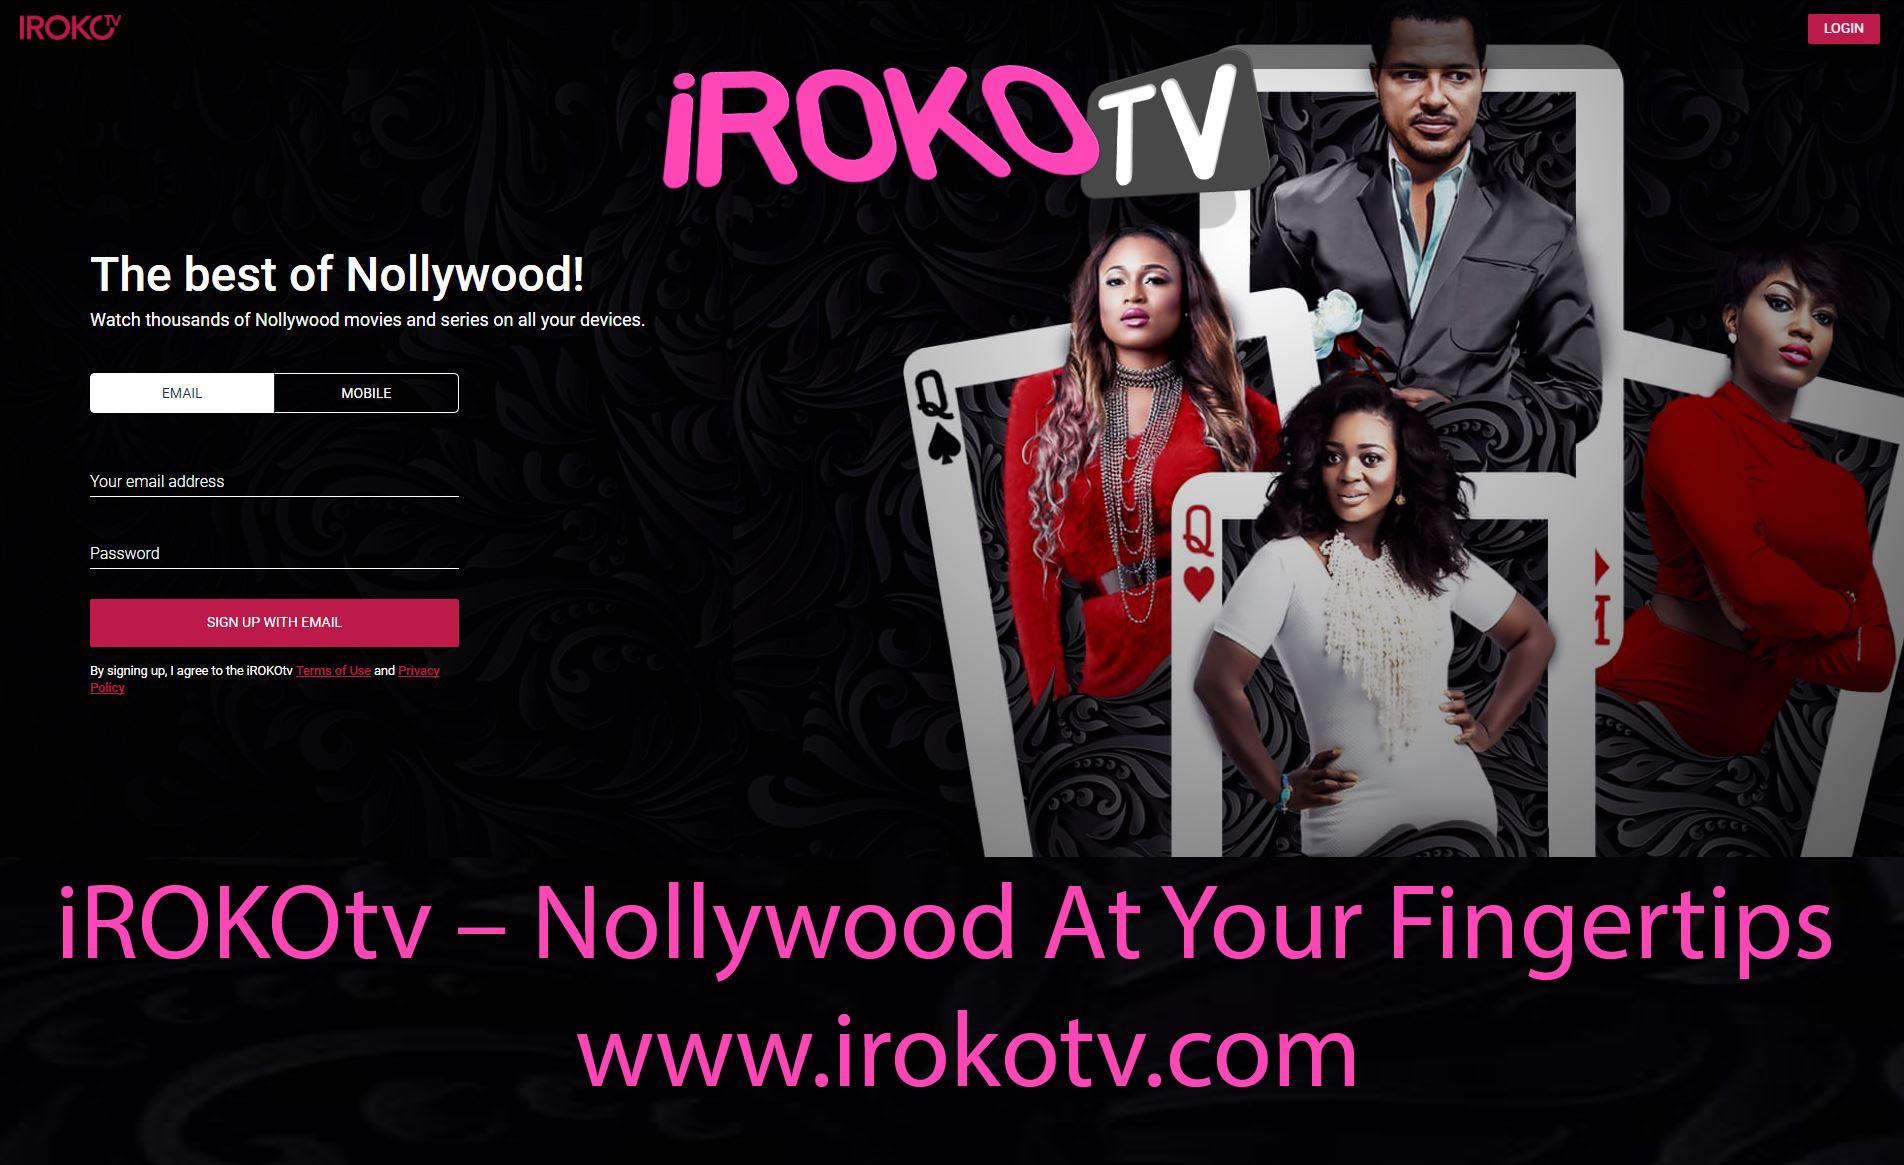 iROKOtv – Nollywood At Your Fingertips | www irokotv com - TecNg